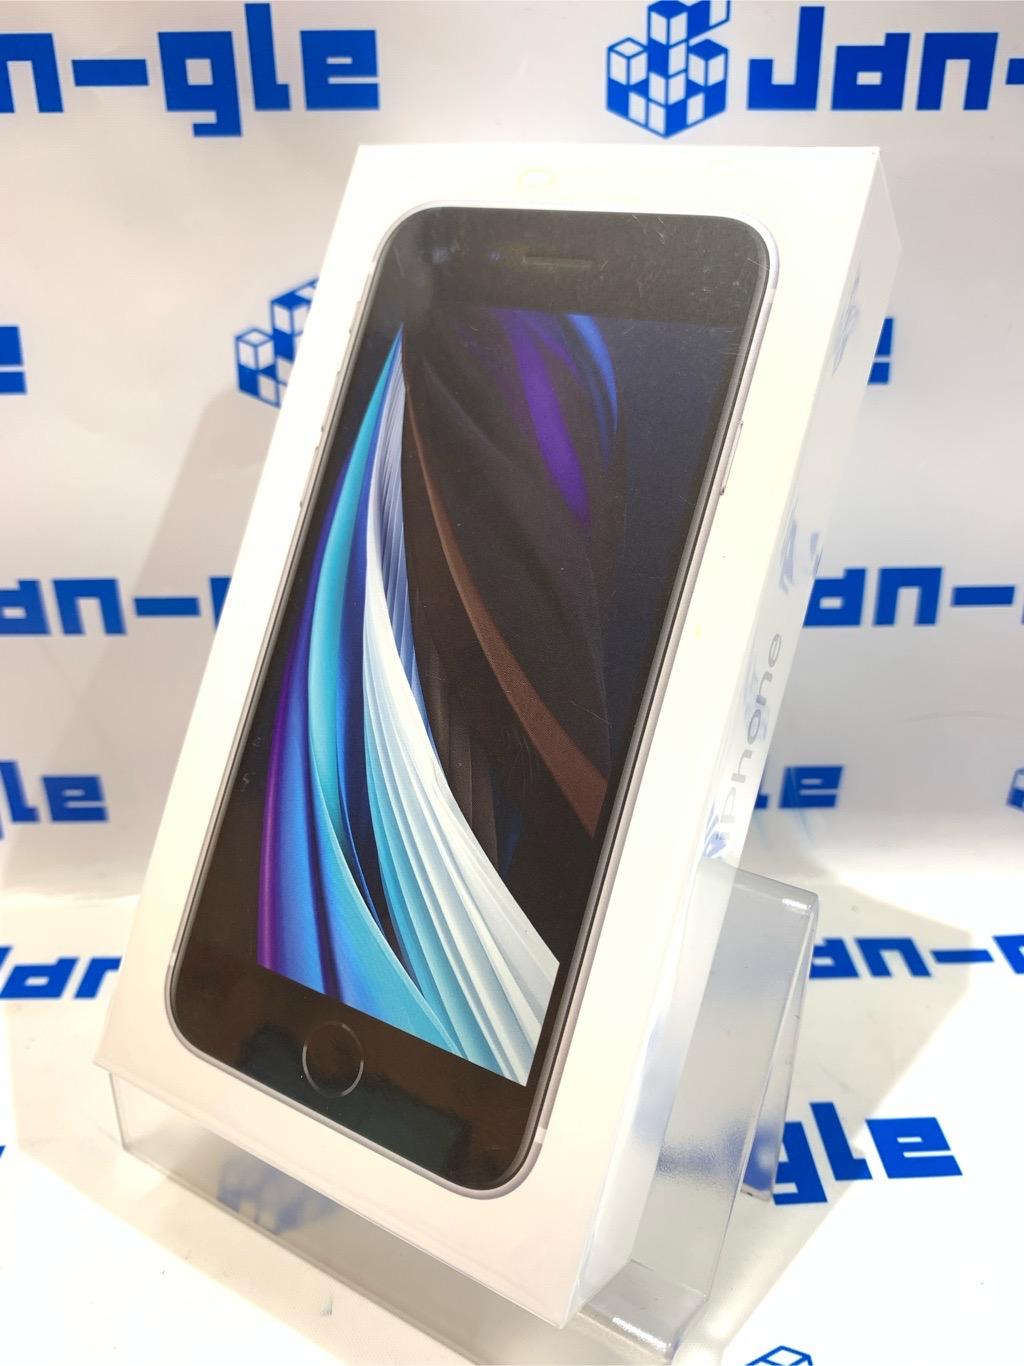 【北海道】【新古品】Apple iPhone SE (第2世代) au SIMロック解除済 64GB MHGQ3J/A